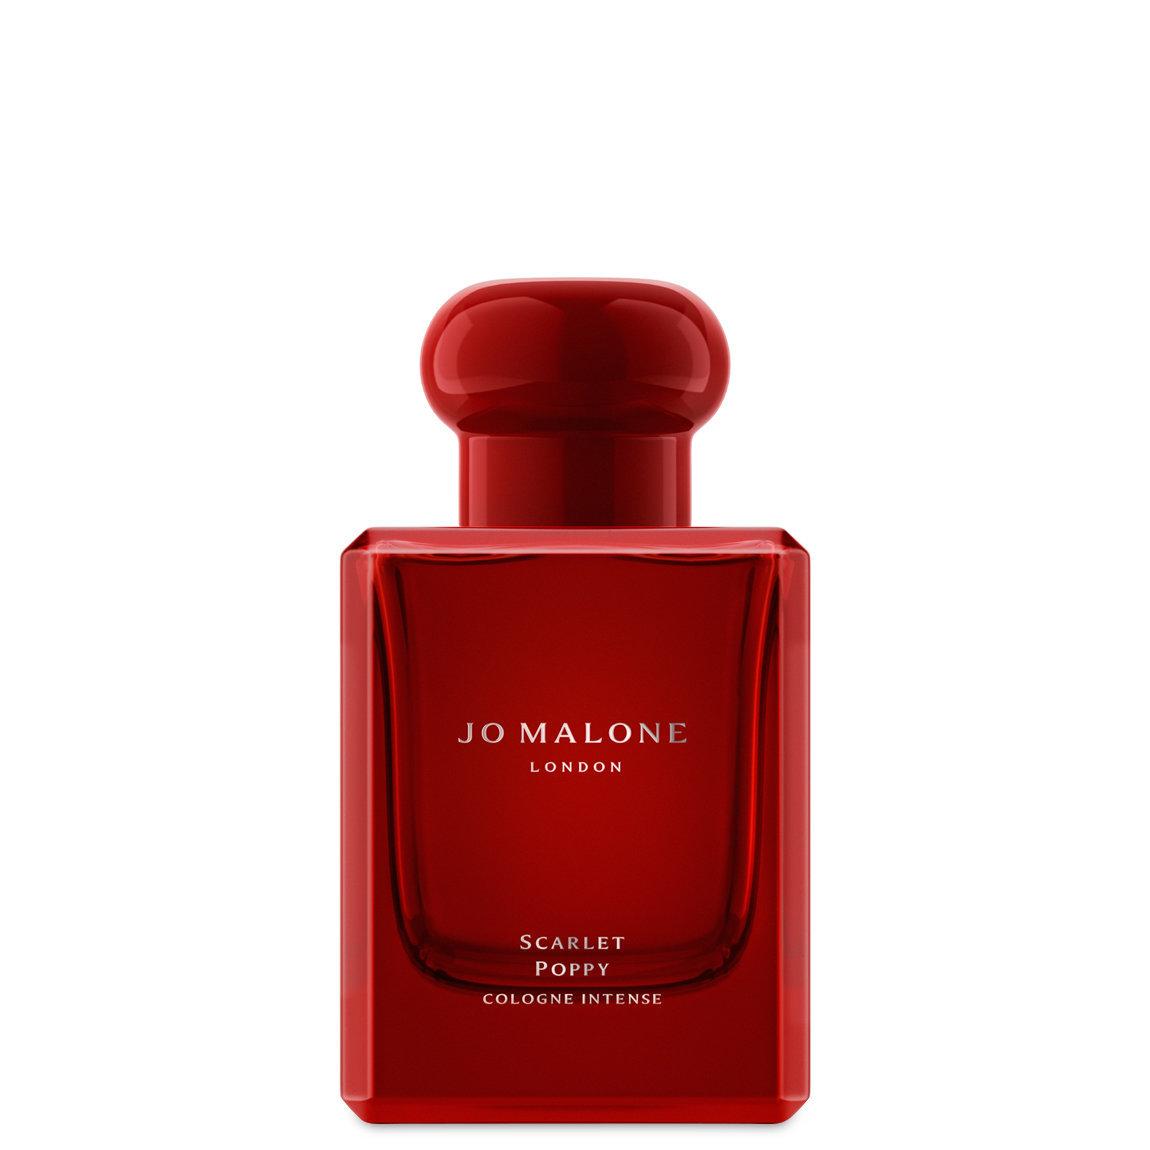 Jo Malone London Scarlet Poppy Cologne Intense 50 ml alternative view 1 - product swatch.